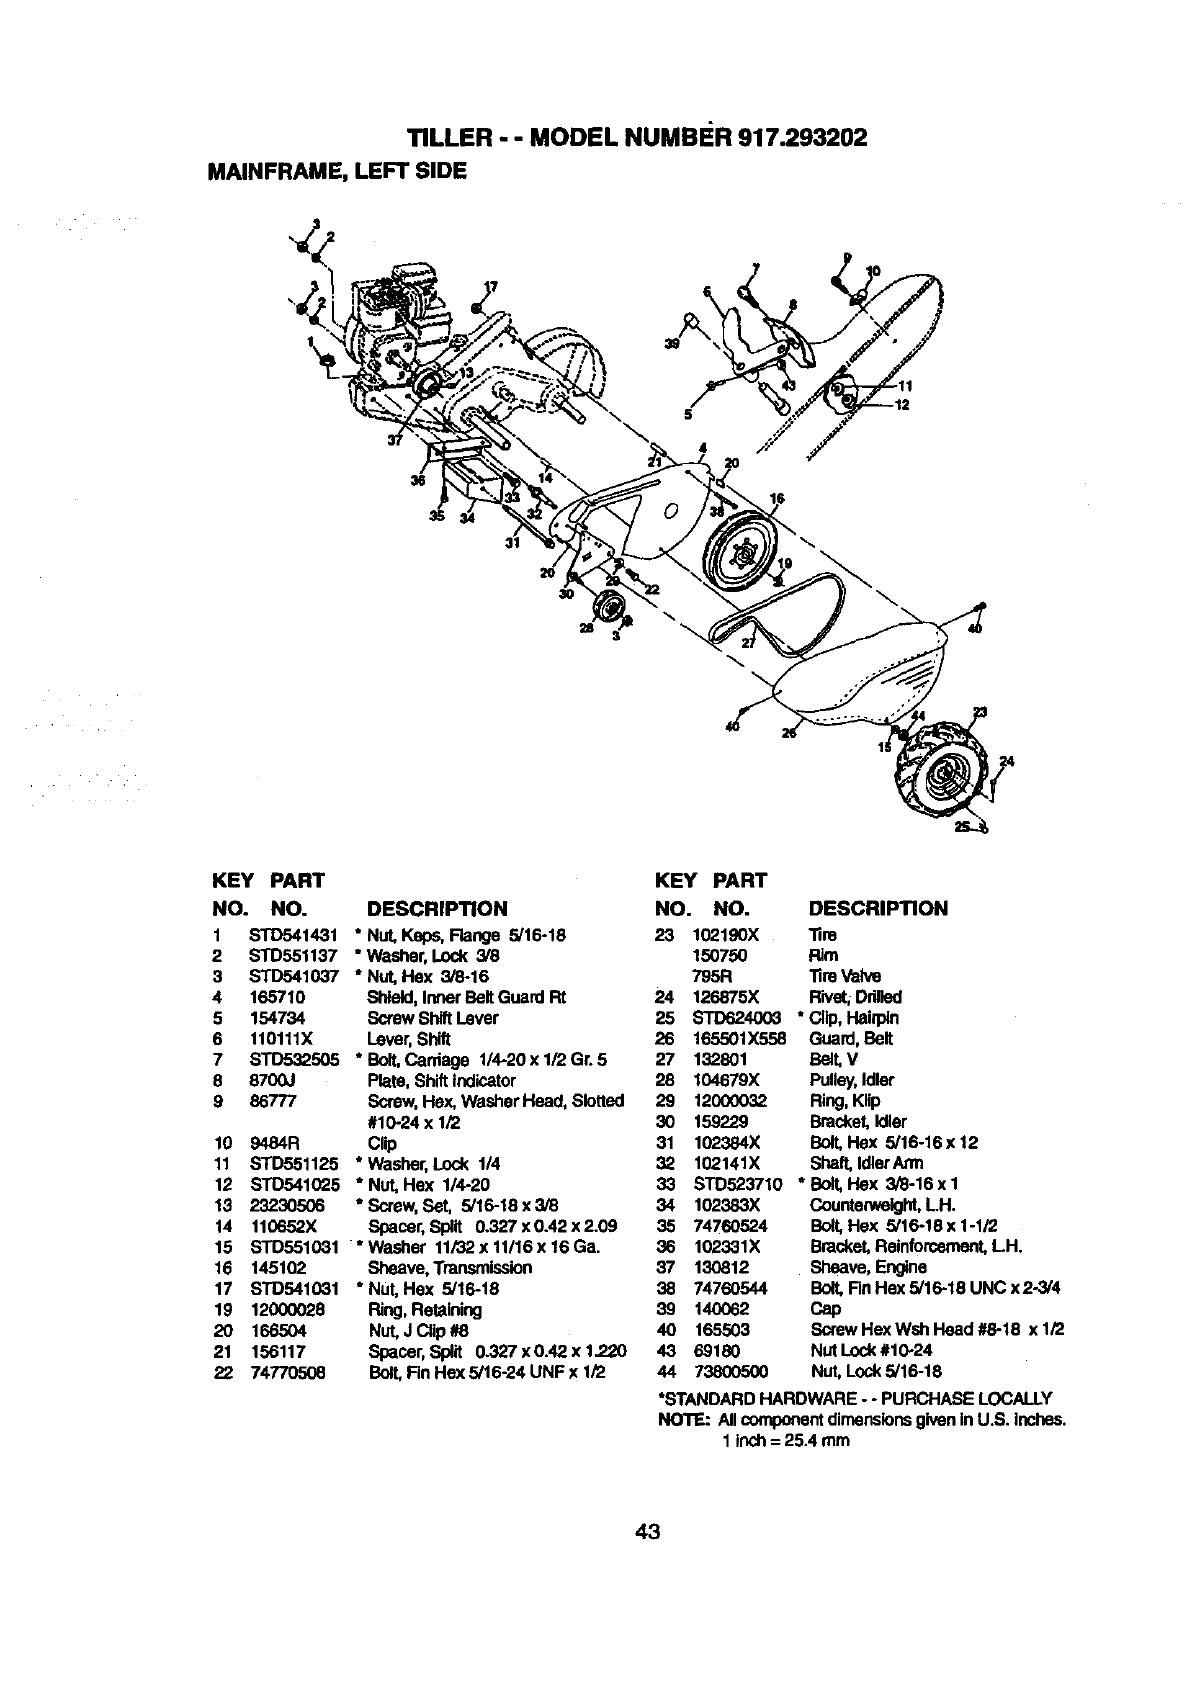 Craftsman 917293202 User Manual TILLER Manuals And Guides